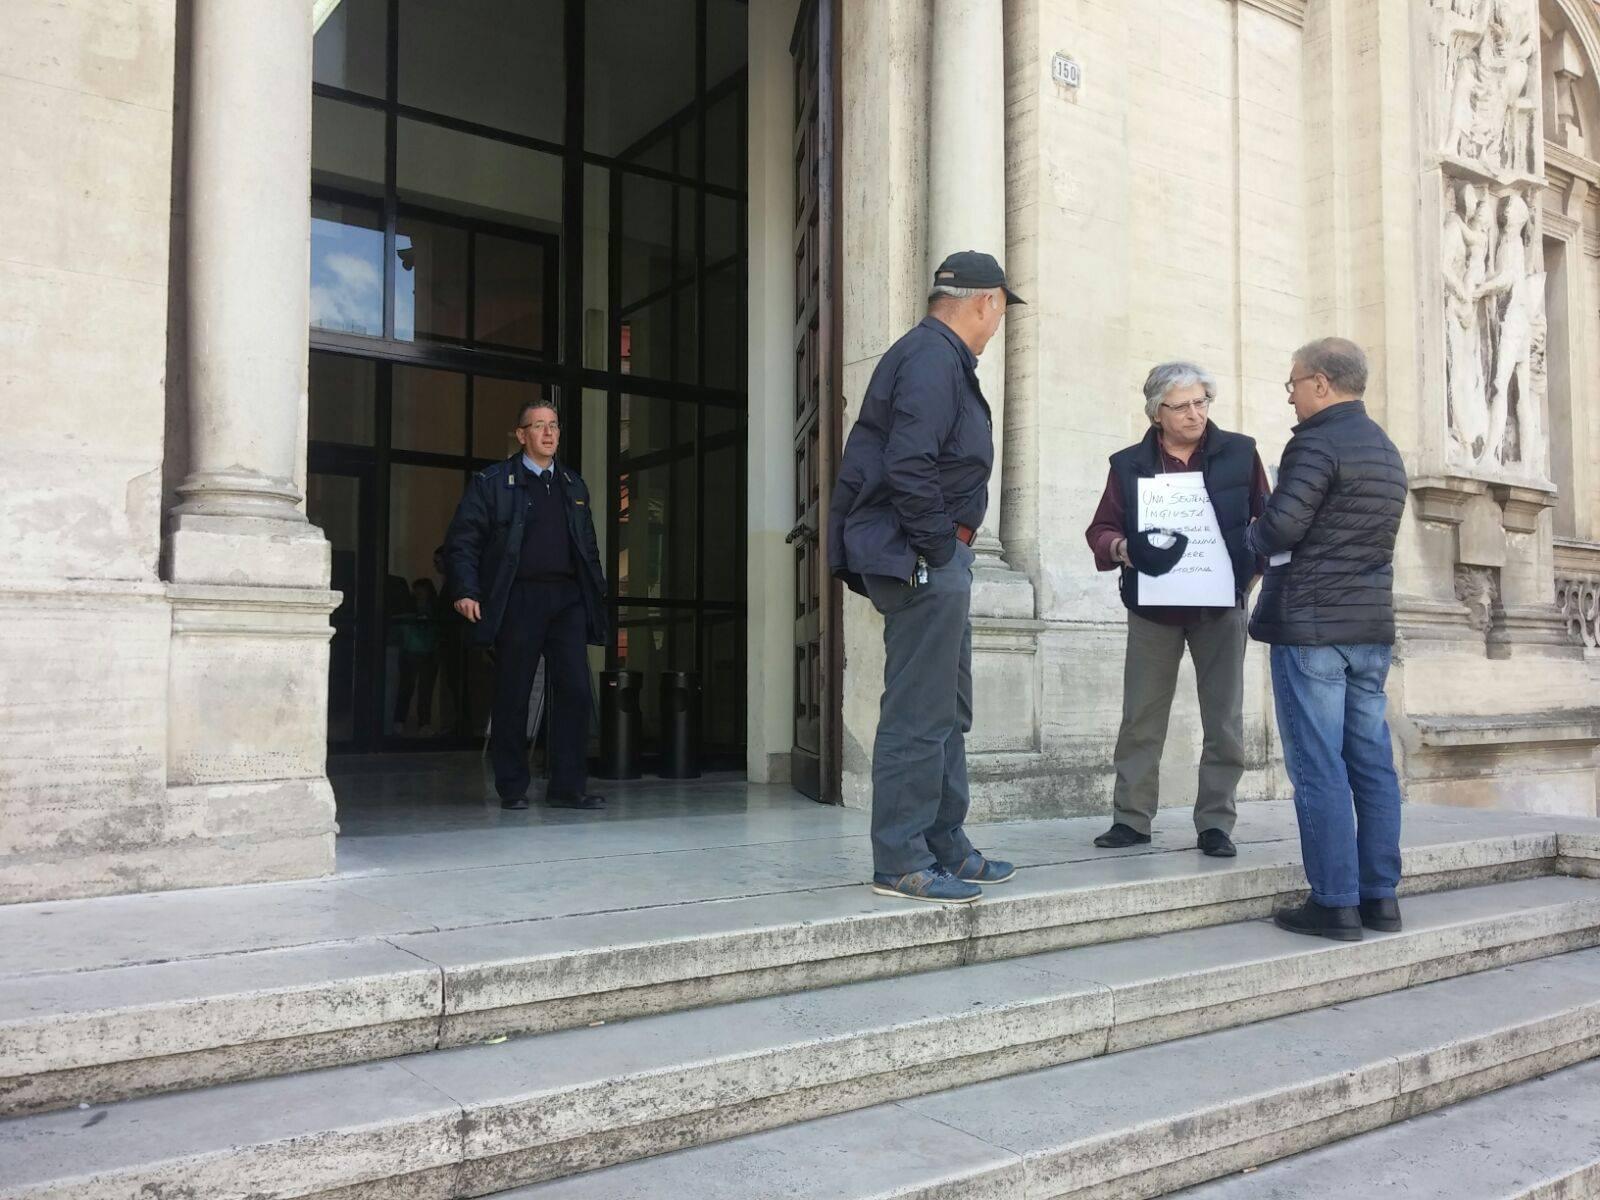 Avezzano: ex sindaco di Civita D'Antino chiede l'elemosina